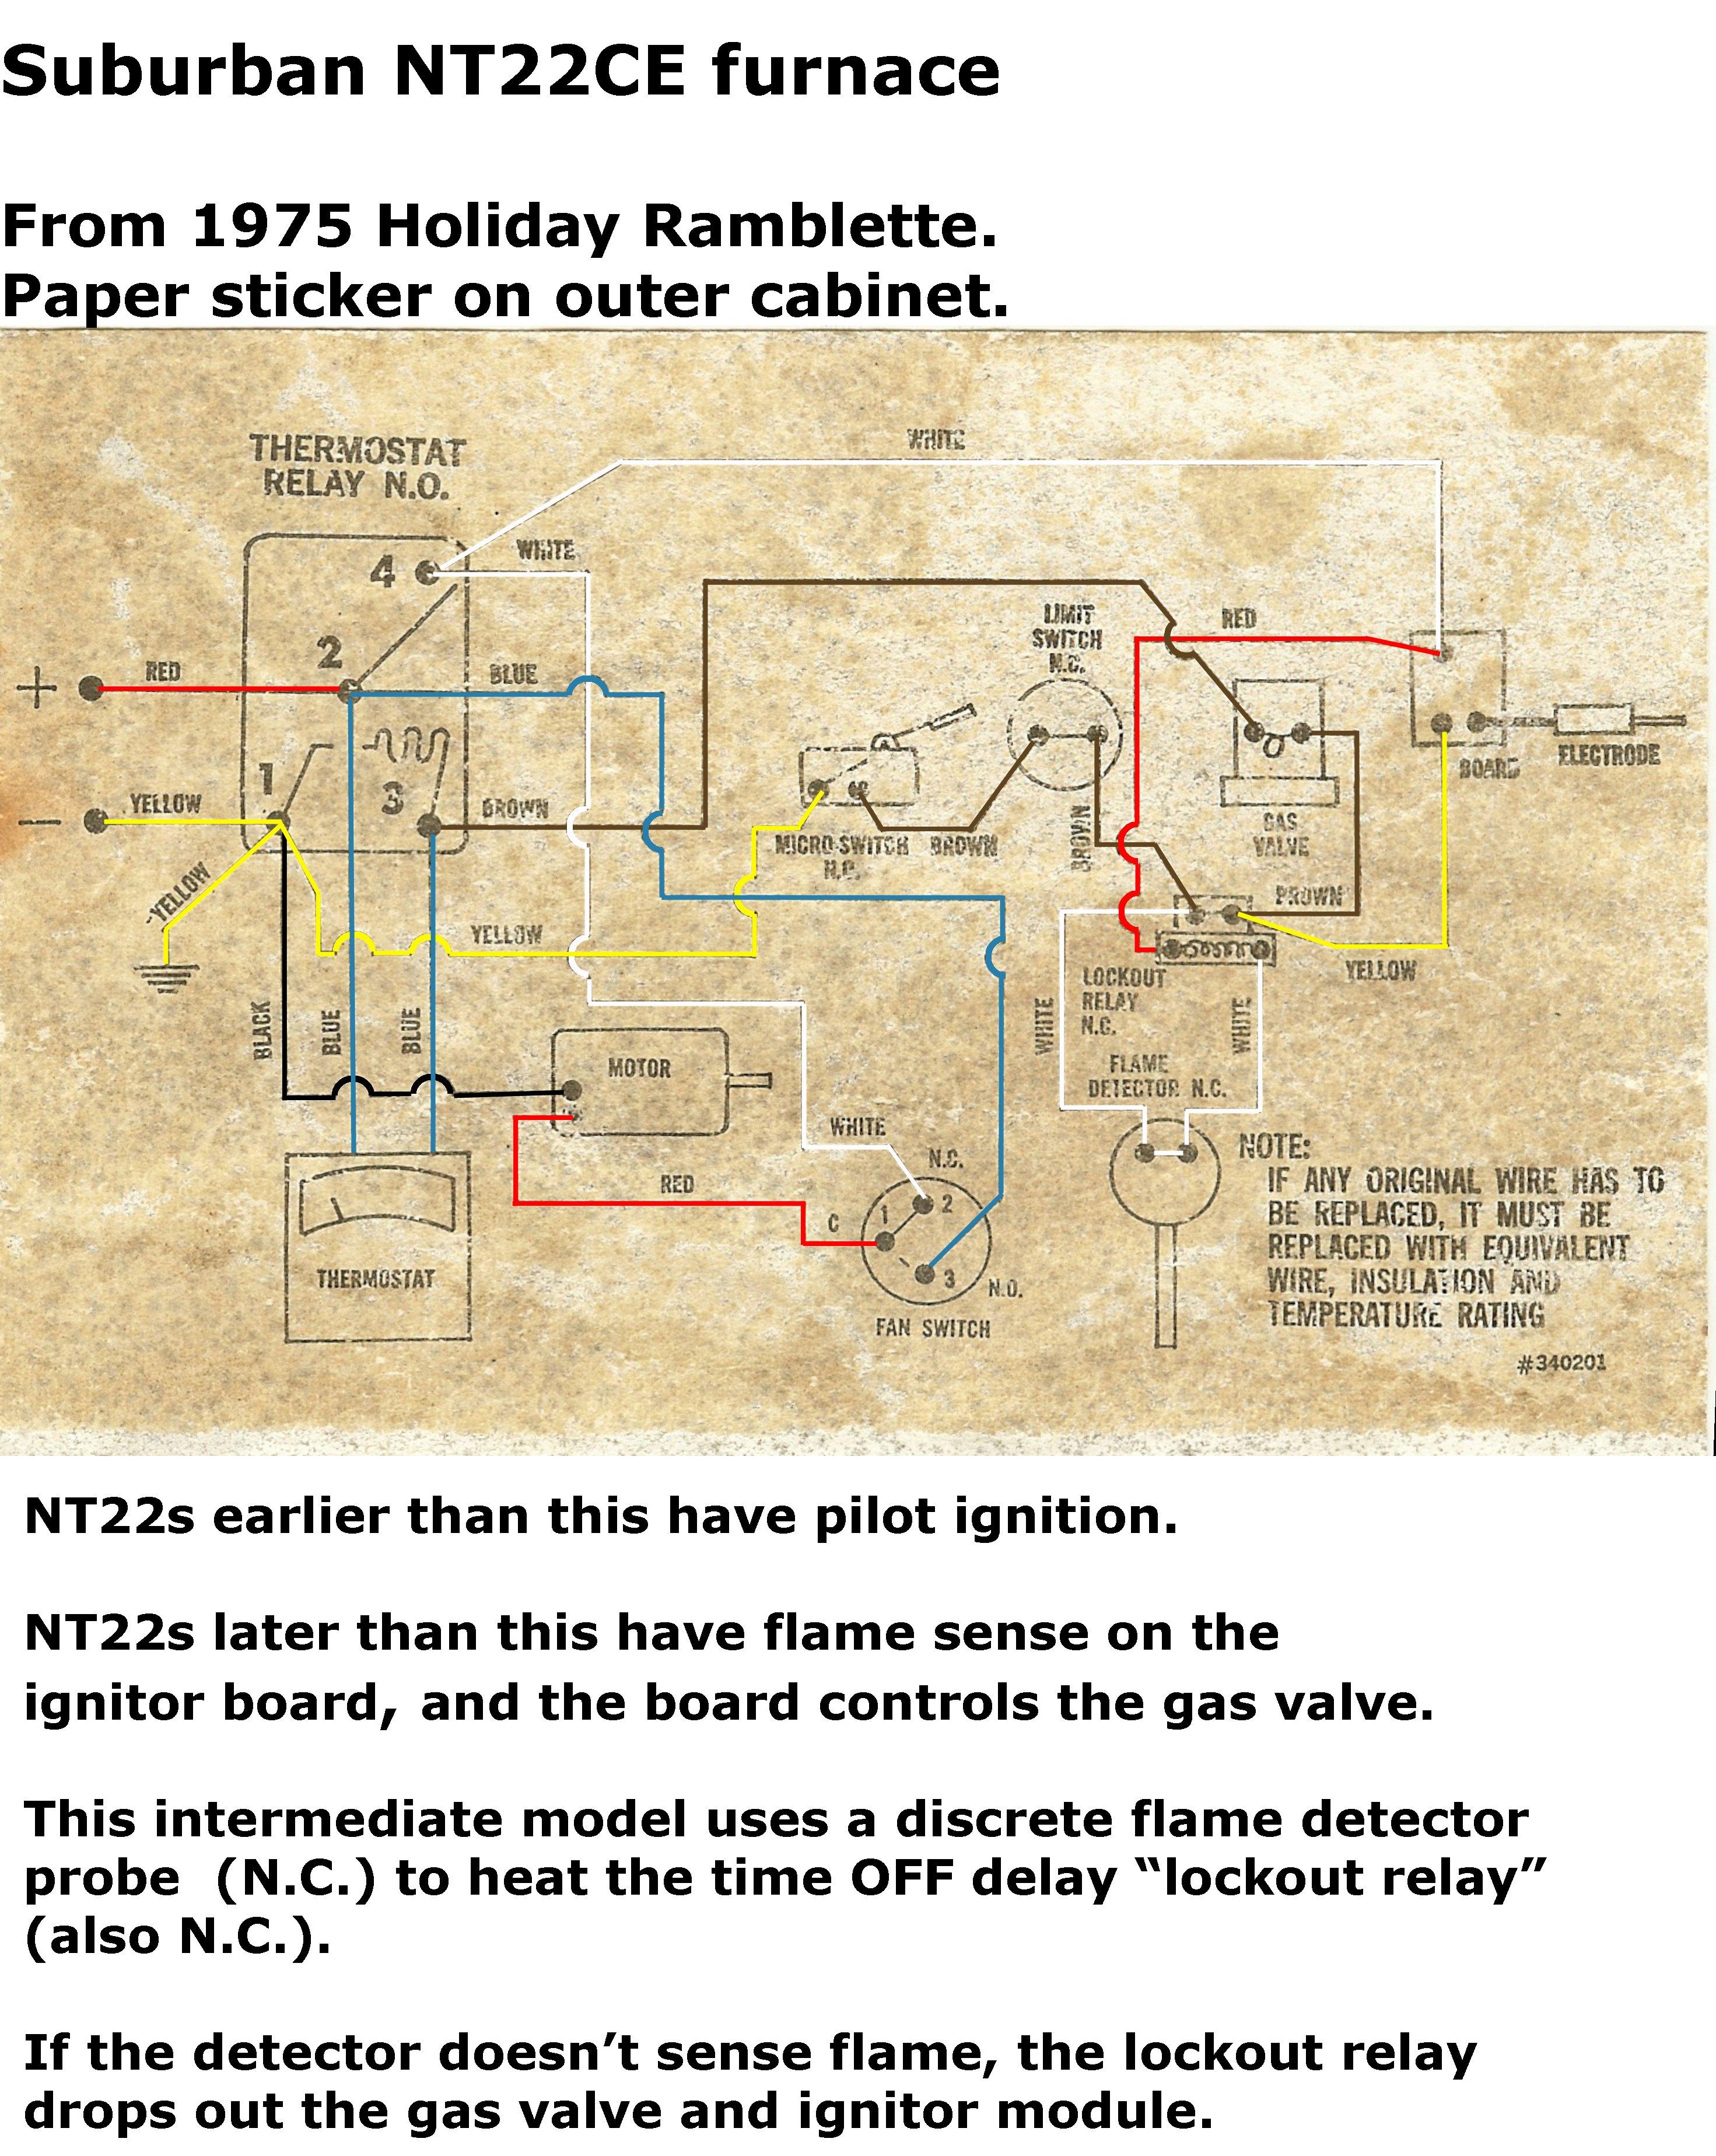 Suburban Rv Furnace Diagram   Wiring Diagram - Suburban Rv Furnace Wiring Diagram